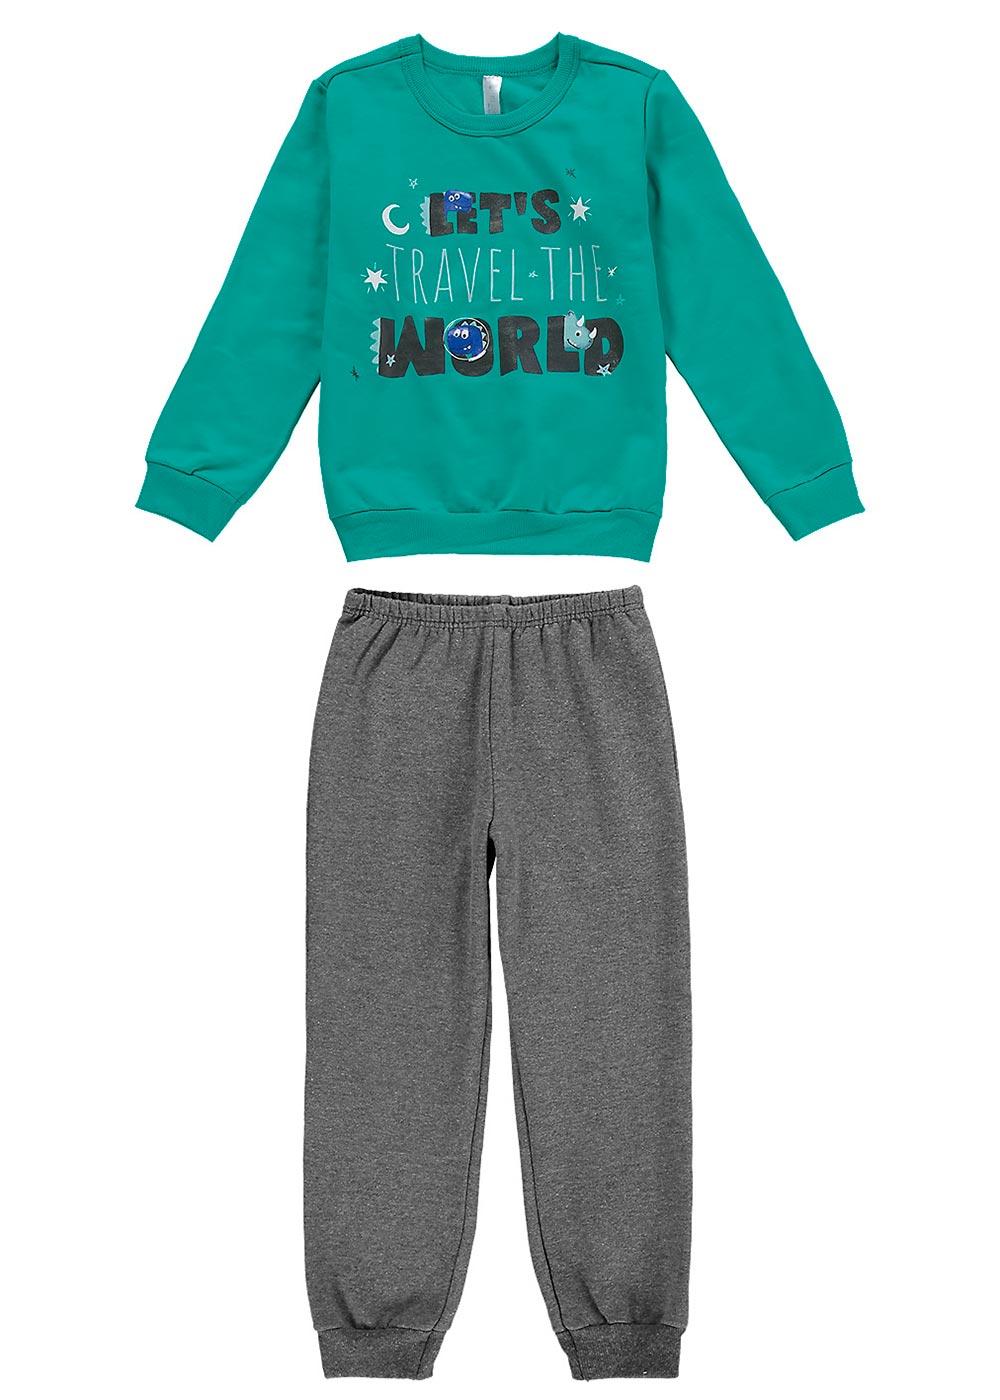 Pijama Infantil Masculino Inverno Verde Travel - Malwee